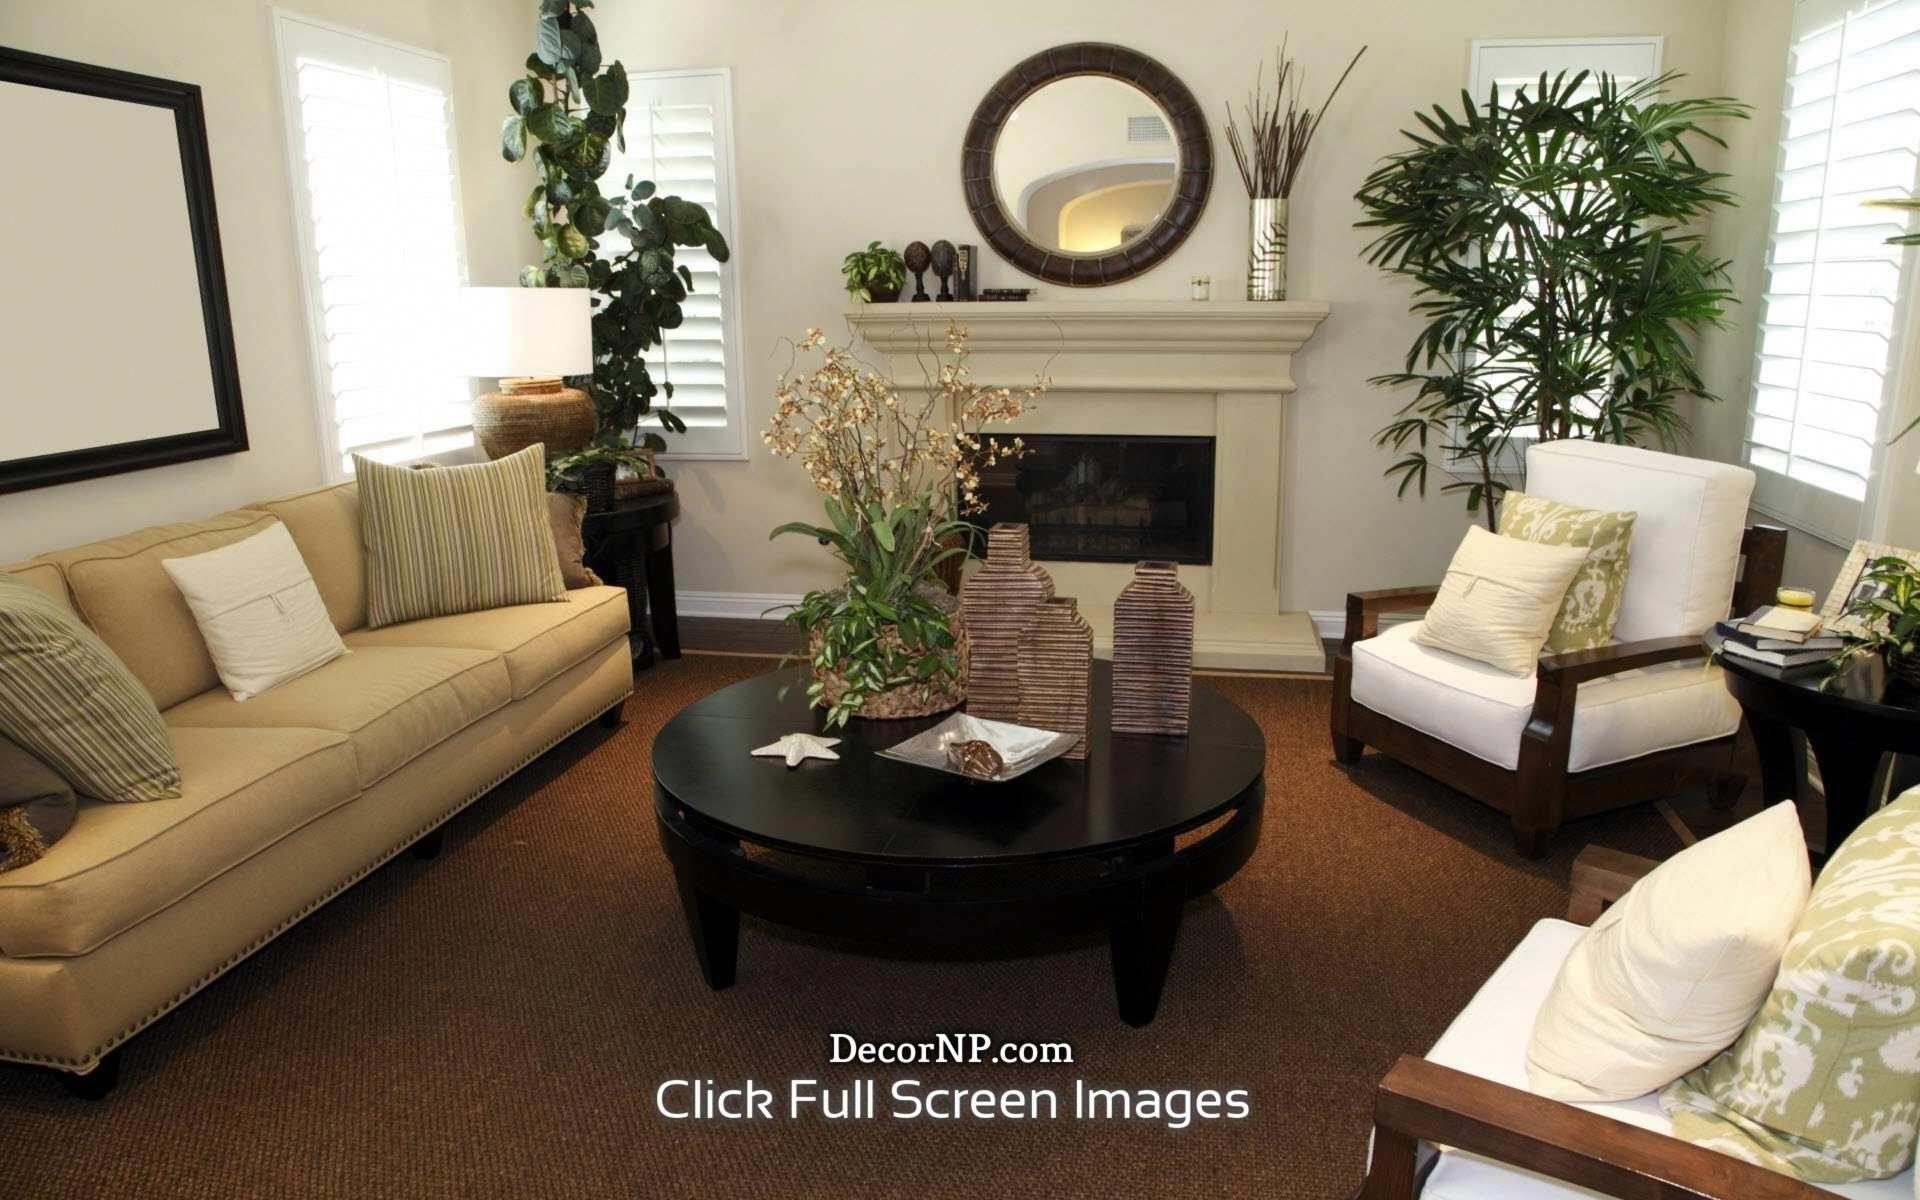 Buy Carpet Runners Online Canada Carpetsremnantsforsale Key 3294928698 Brown Carpet Living Room Small Living Room Decor Living Room Furniture Arrangement